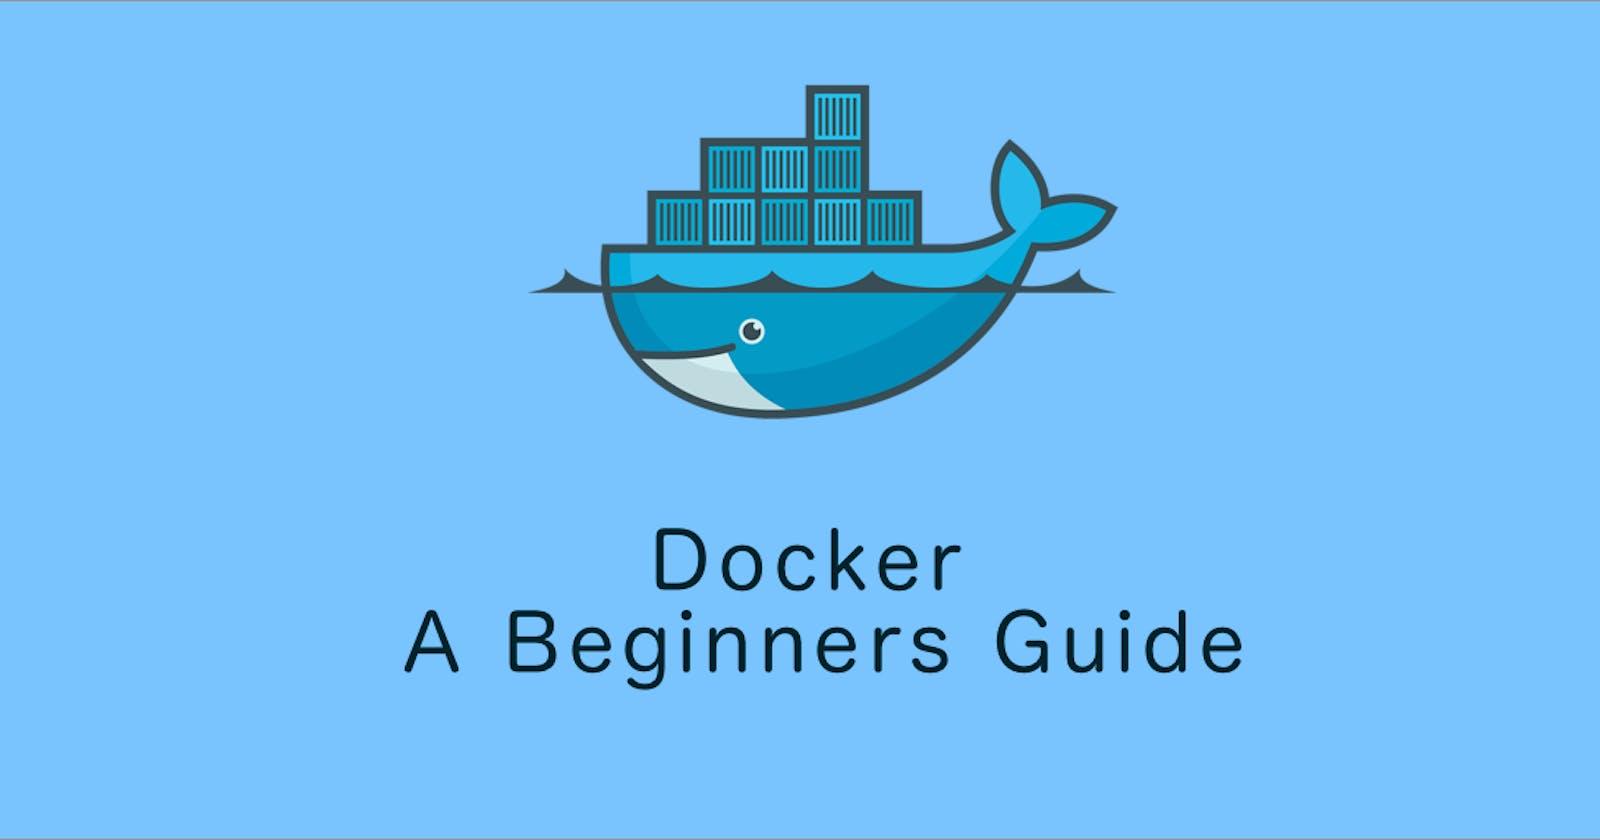 Docker: A Beginners Guide